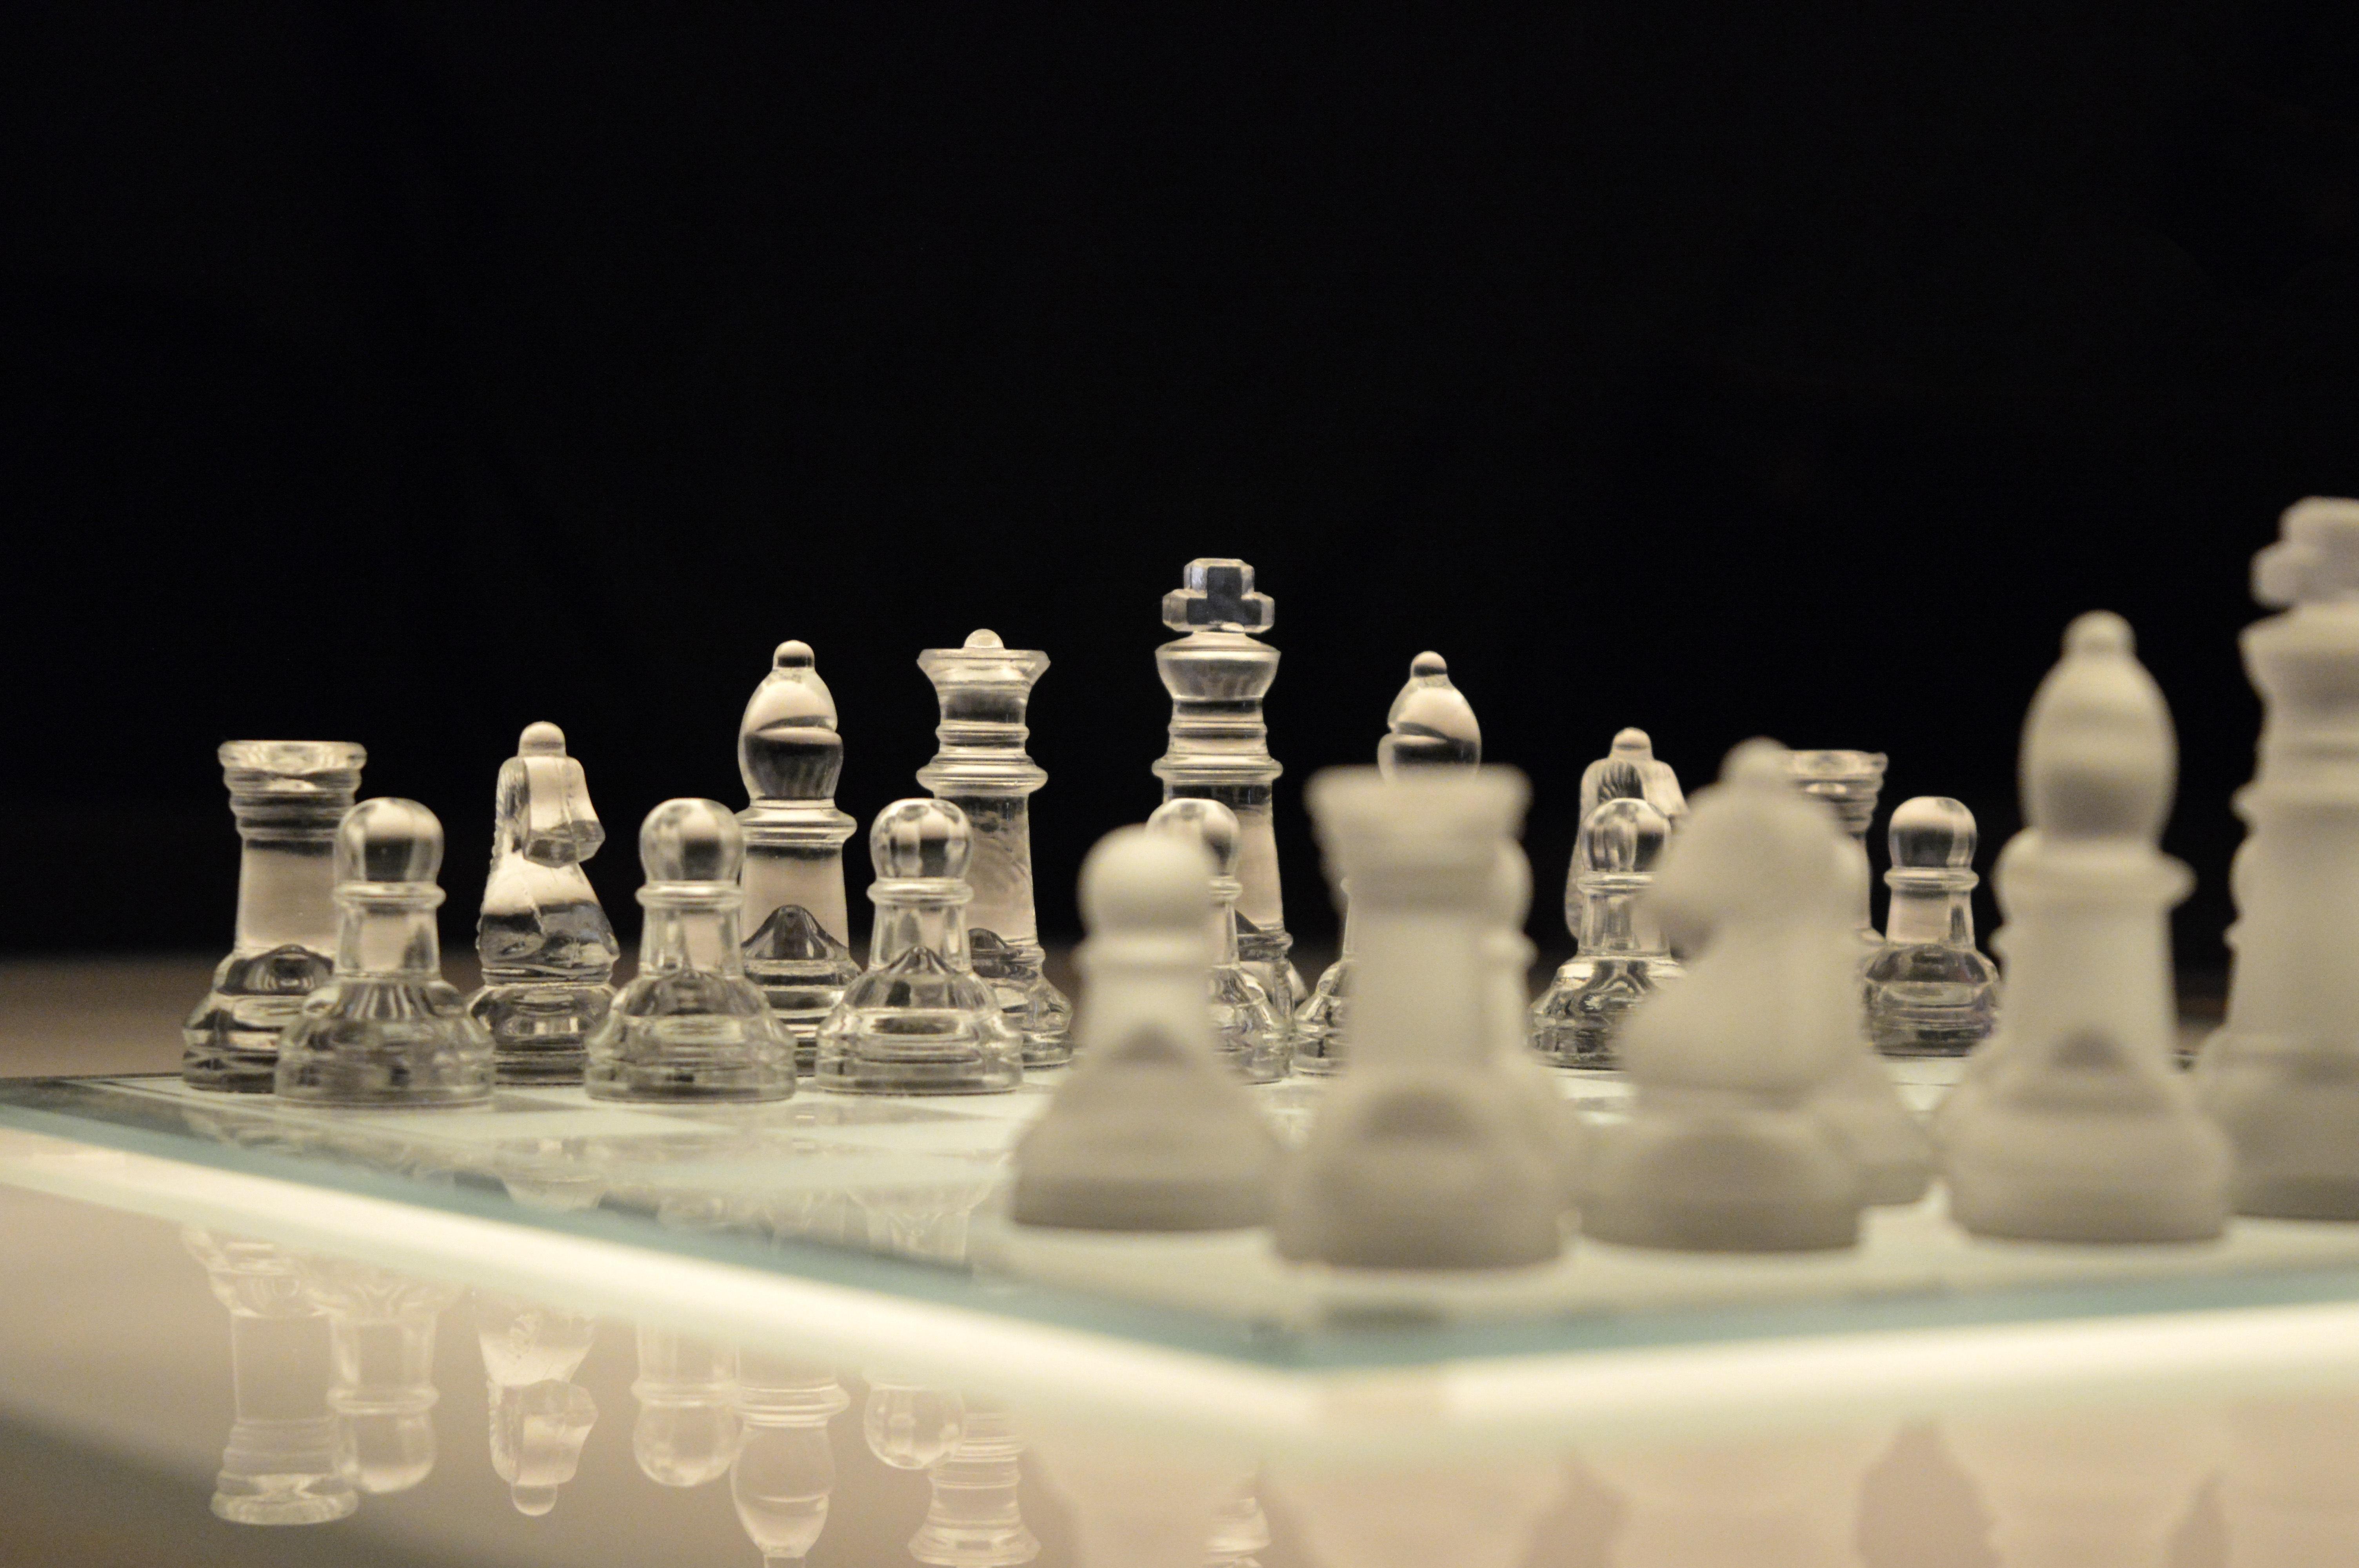 Aprender a delegar: 3 consejos claves para crear un equipo ganador - Time Manager